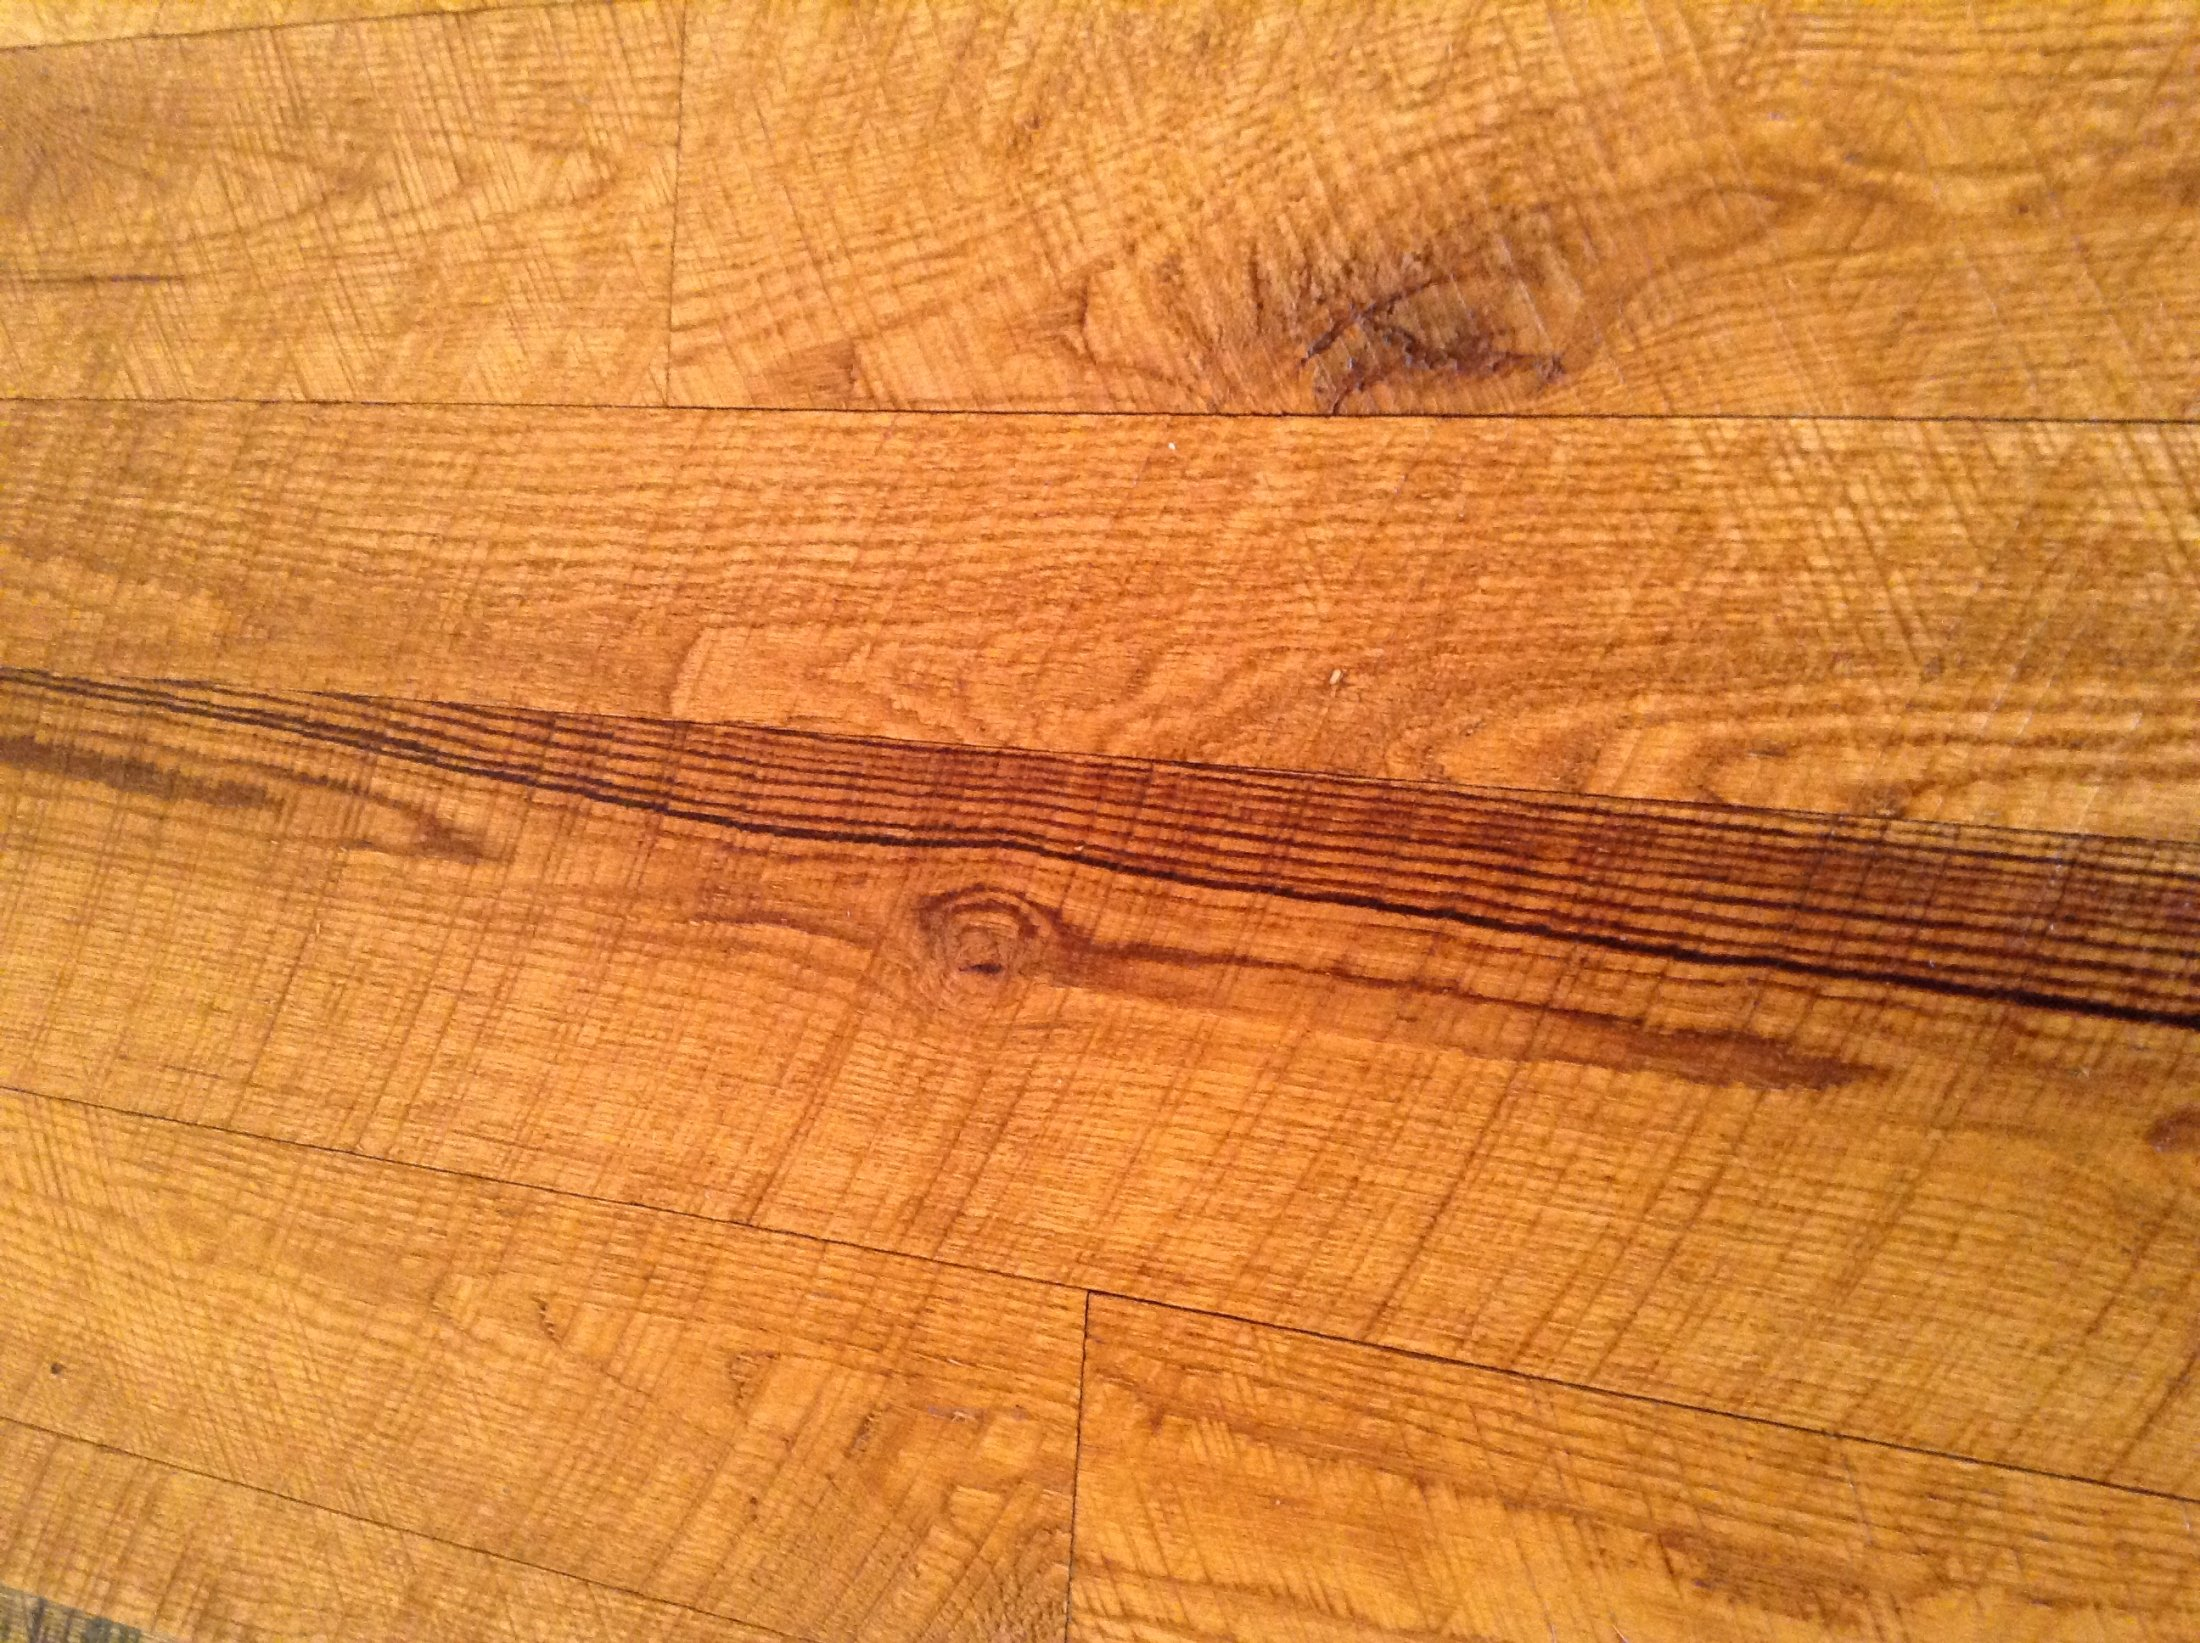 Using A Hand Plane Vs Sanding Cedar Planks Woodworking Talk Woodworkers Forum